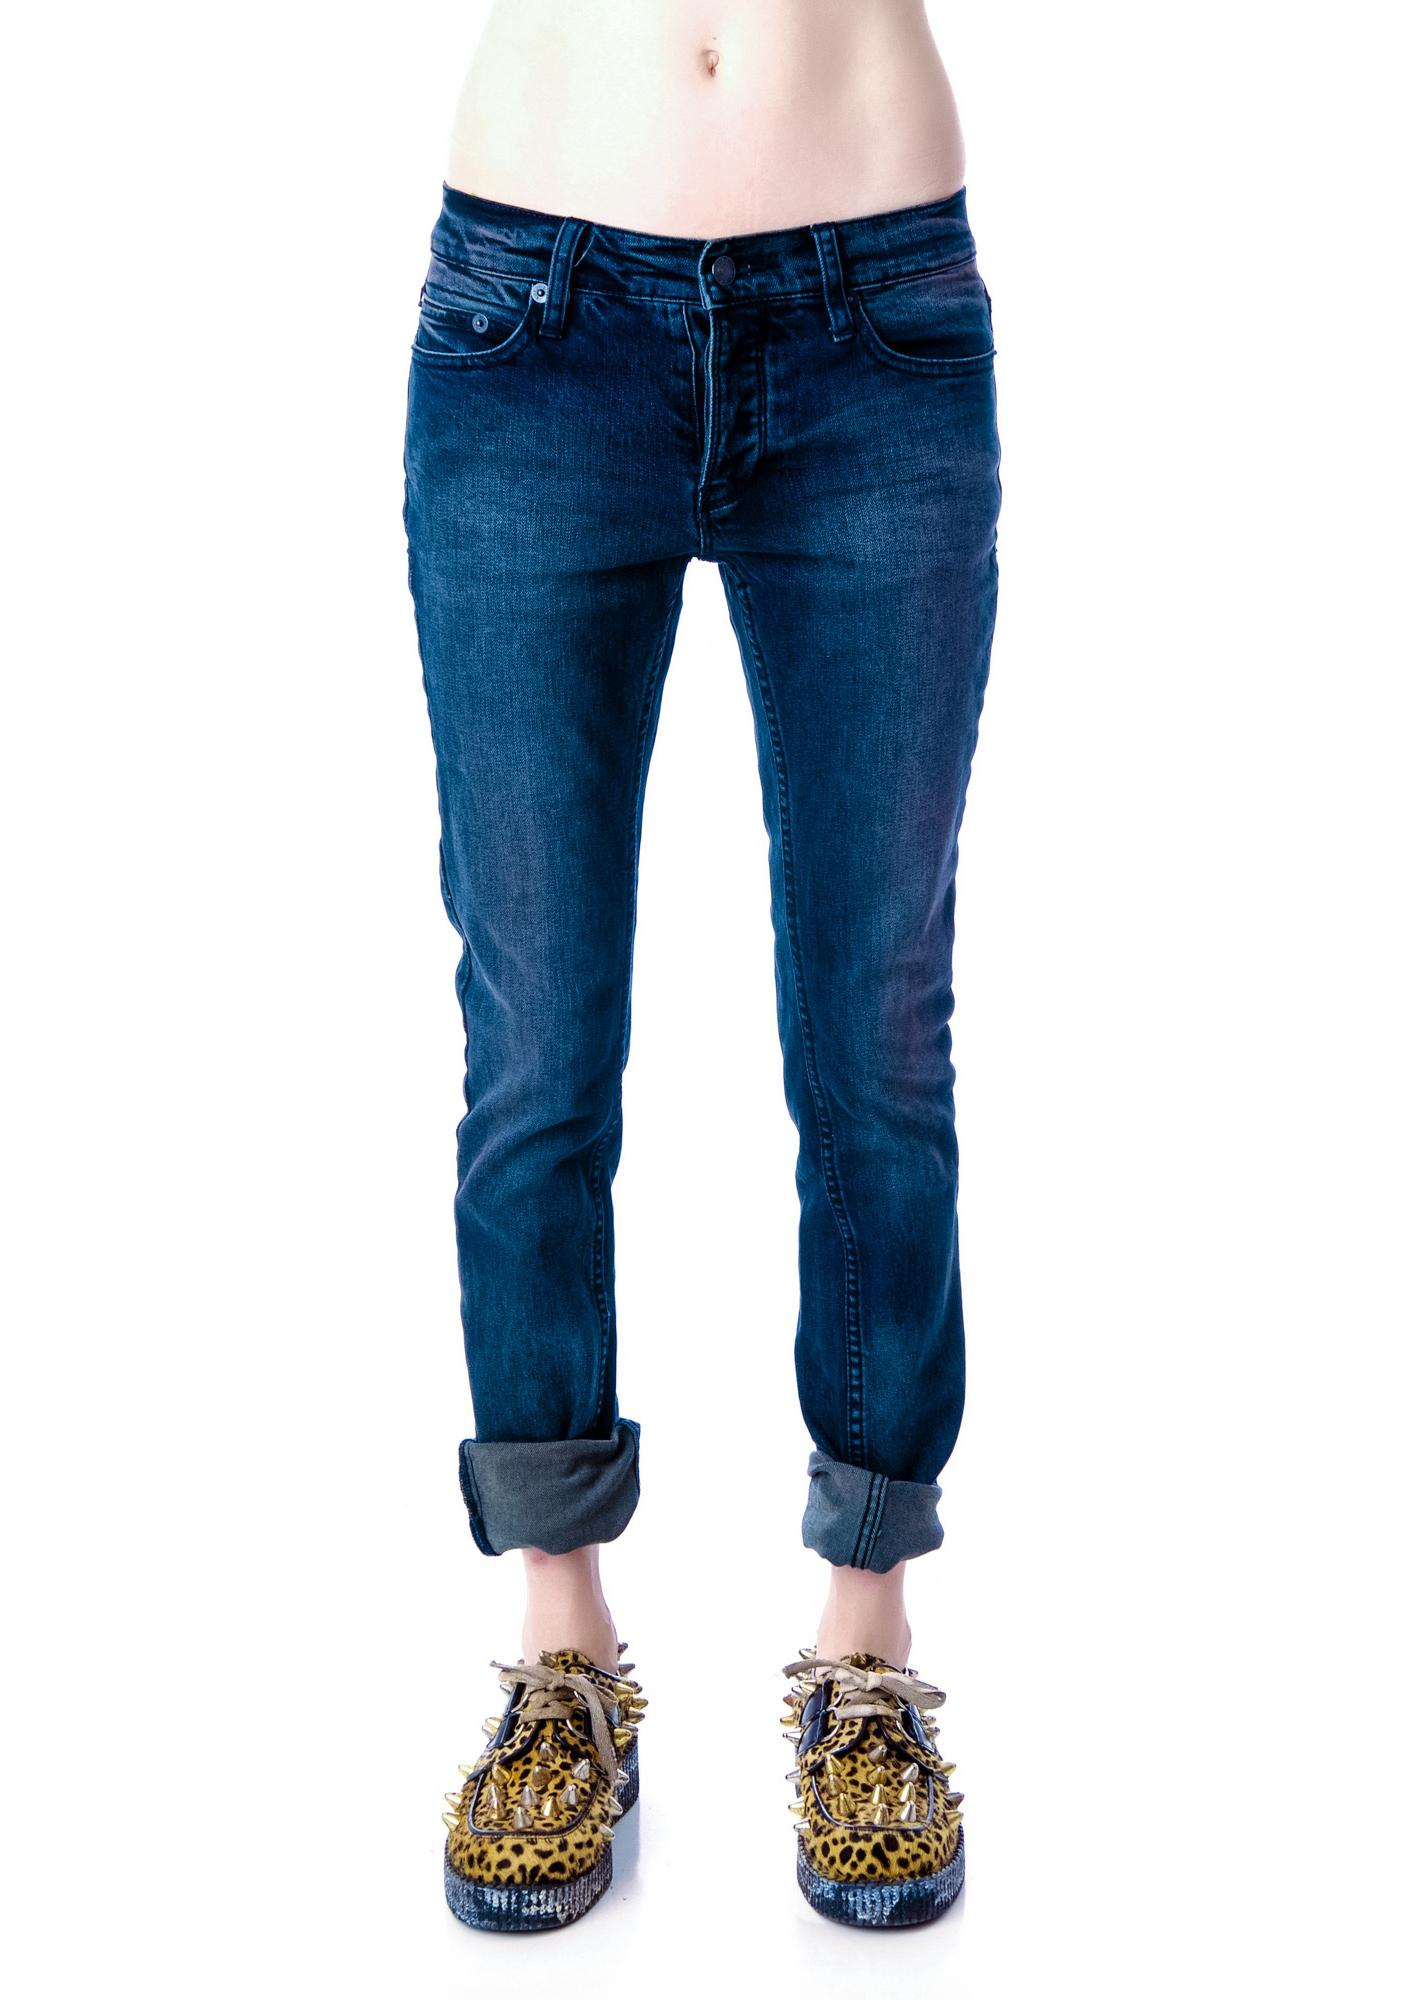 Kill City Brimstone Junkie Boyfriend Jeans